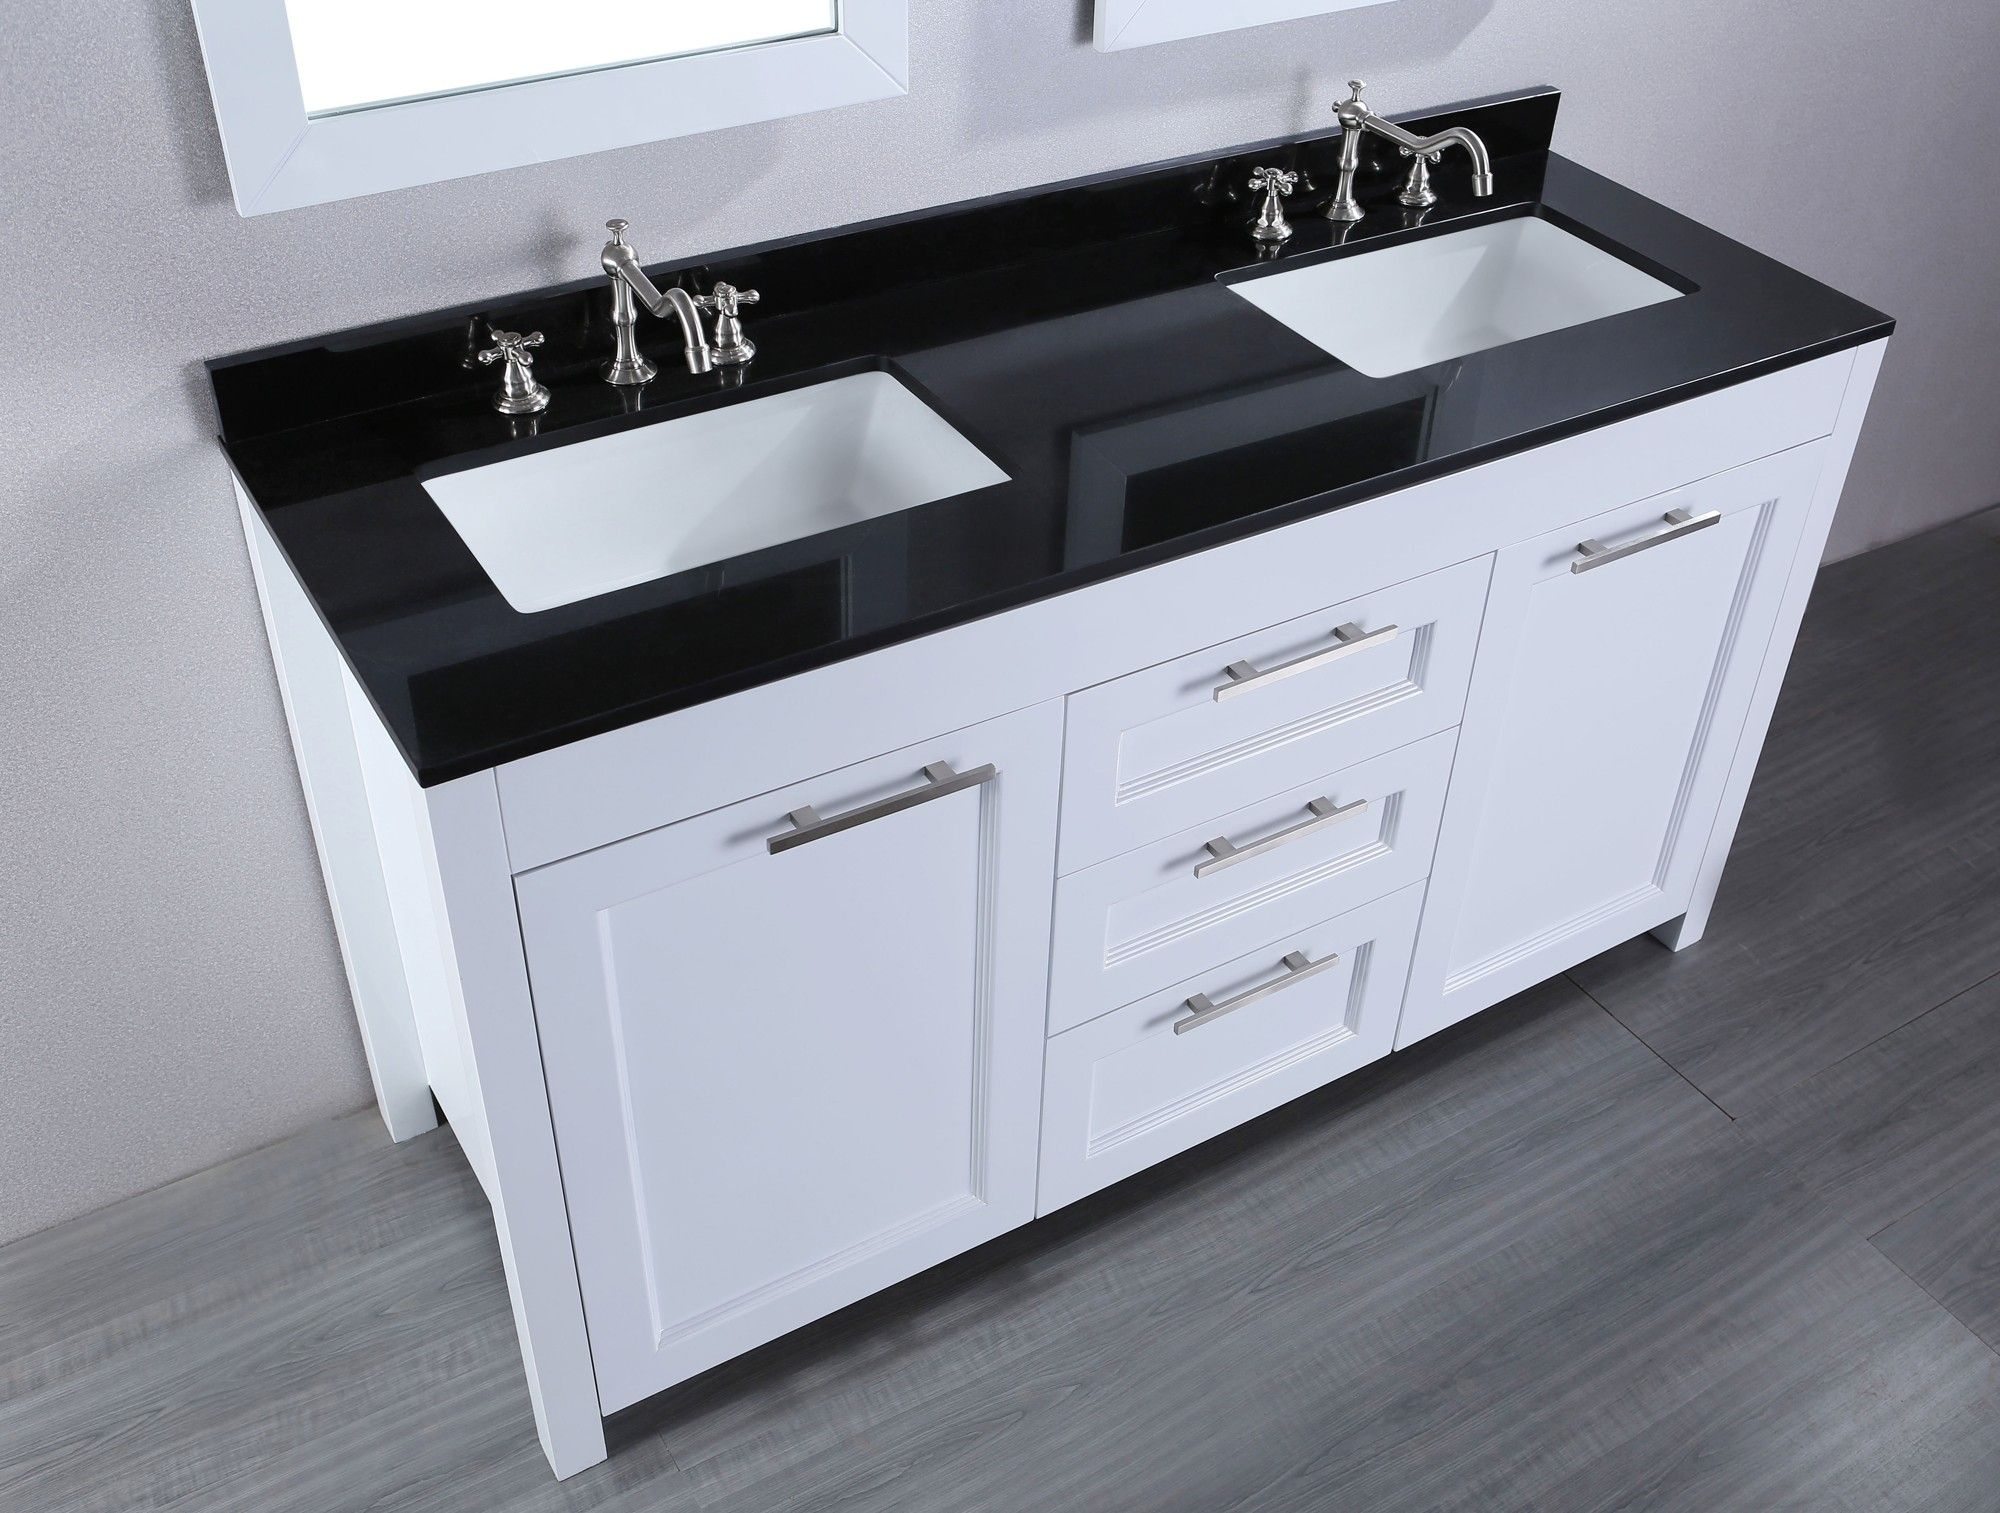 BathroomDesign Bathroom Onyx Black Granite Vanity Countertops Under Framed Mirrors Exquisite